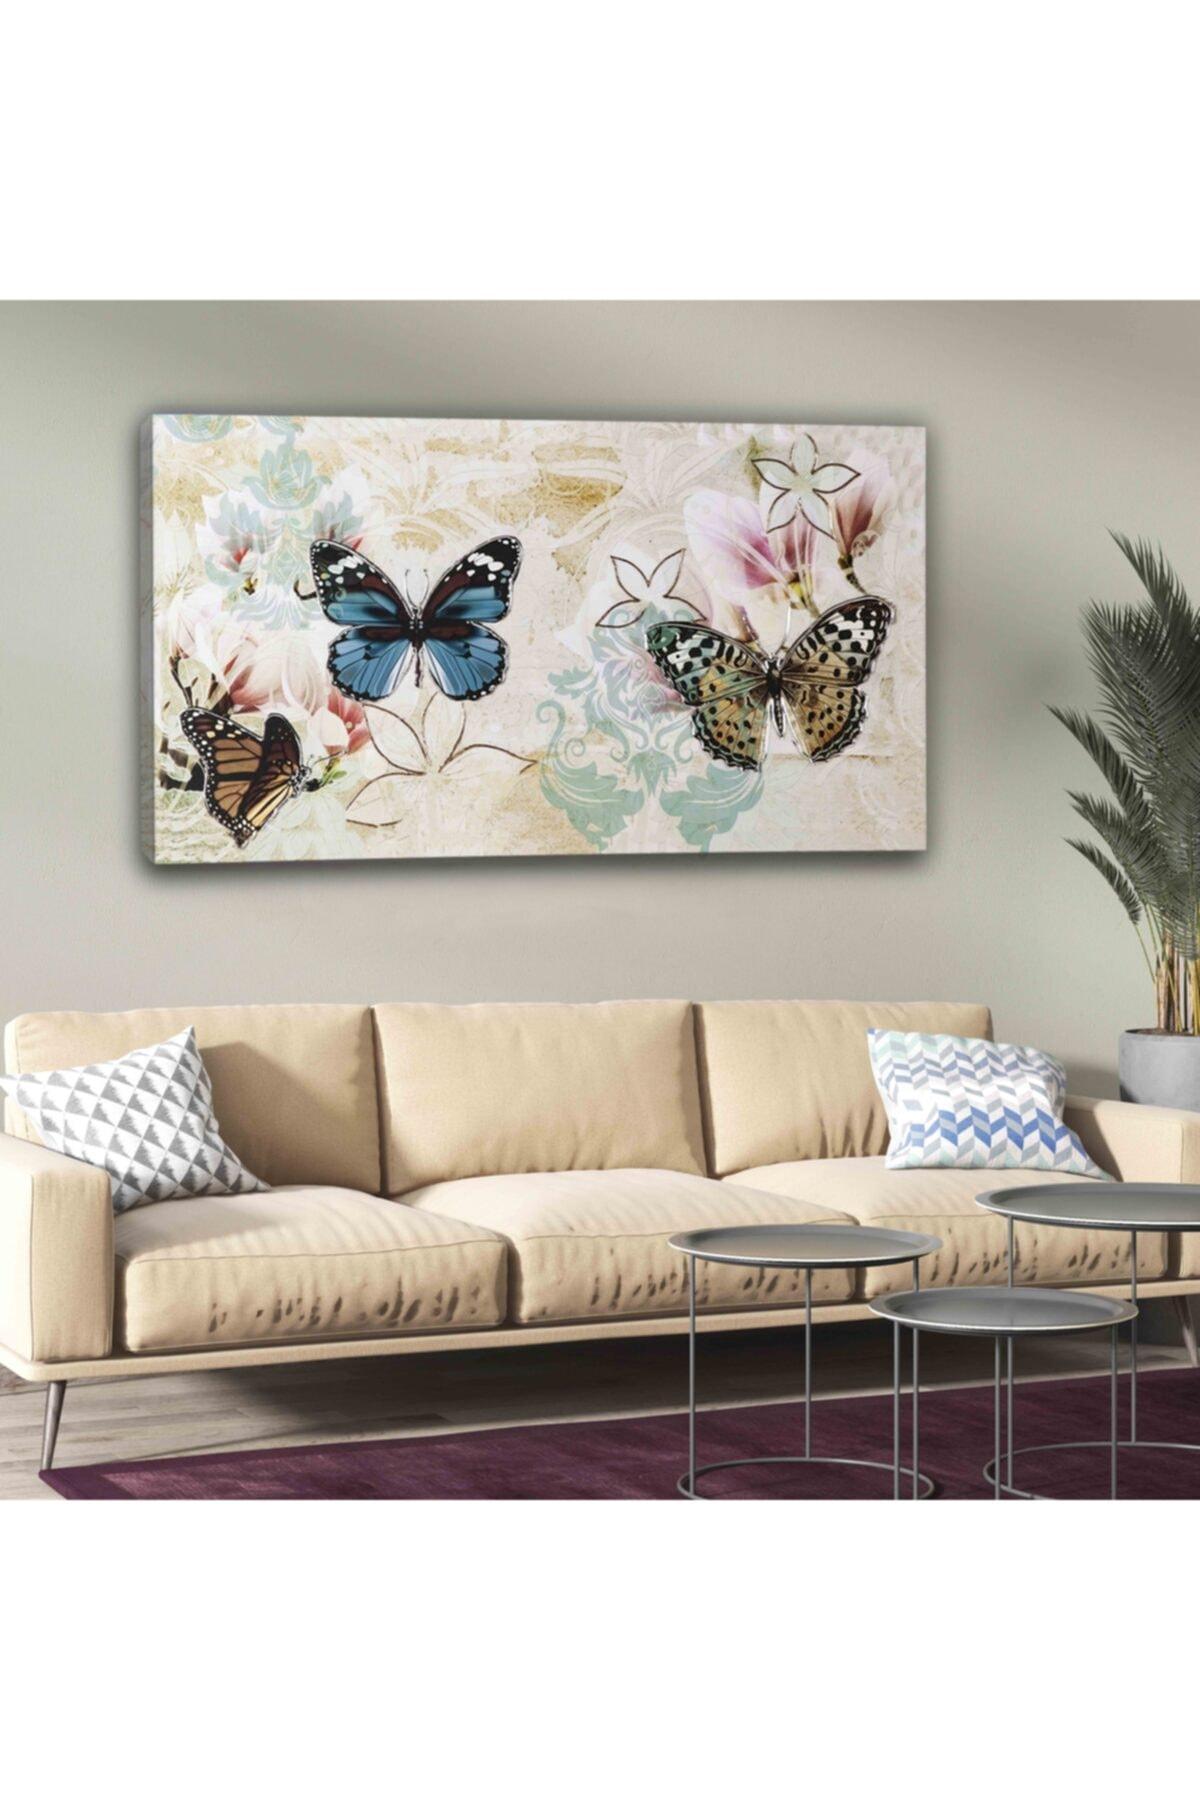 hanhomeart Kelebek Dekor Kanvas Tuval Tablo